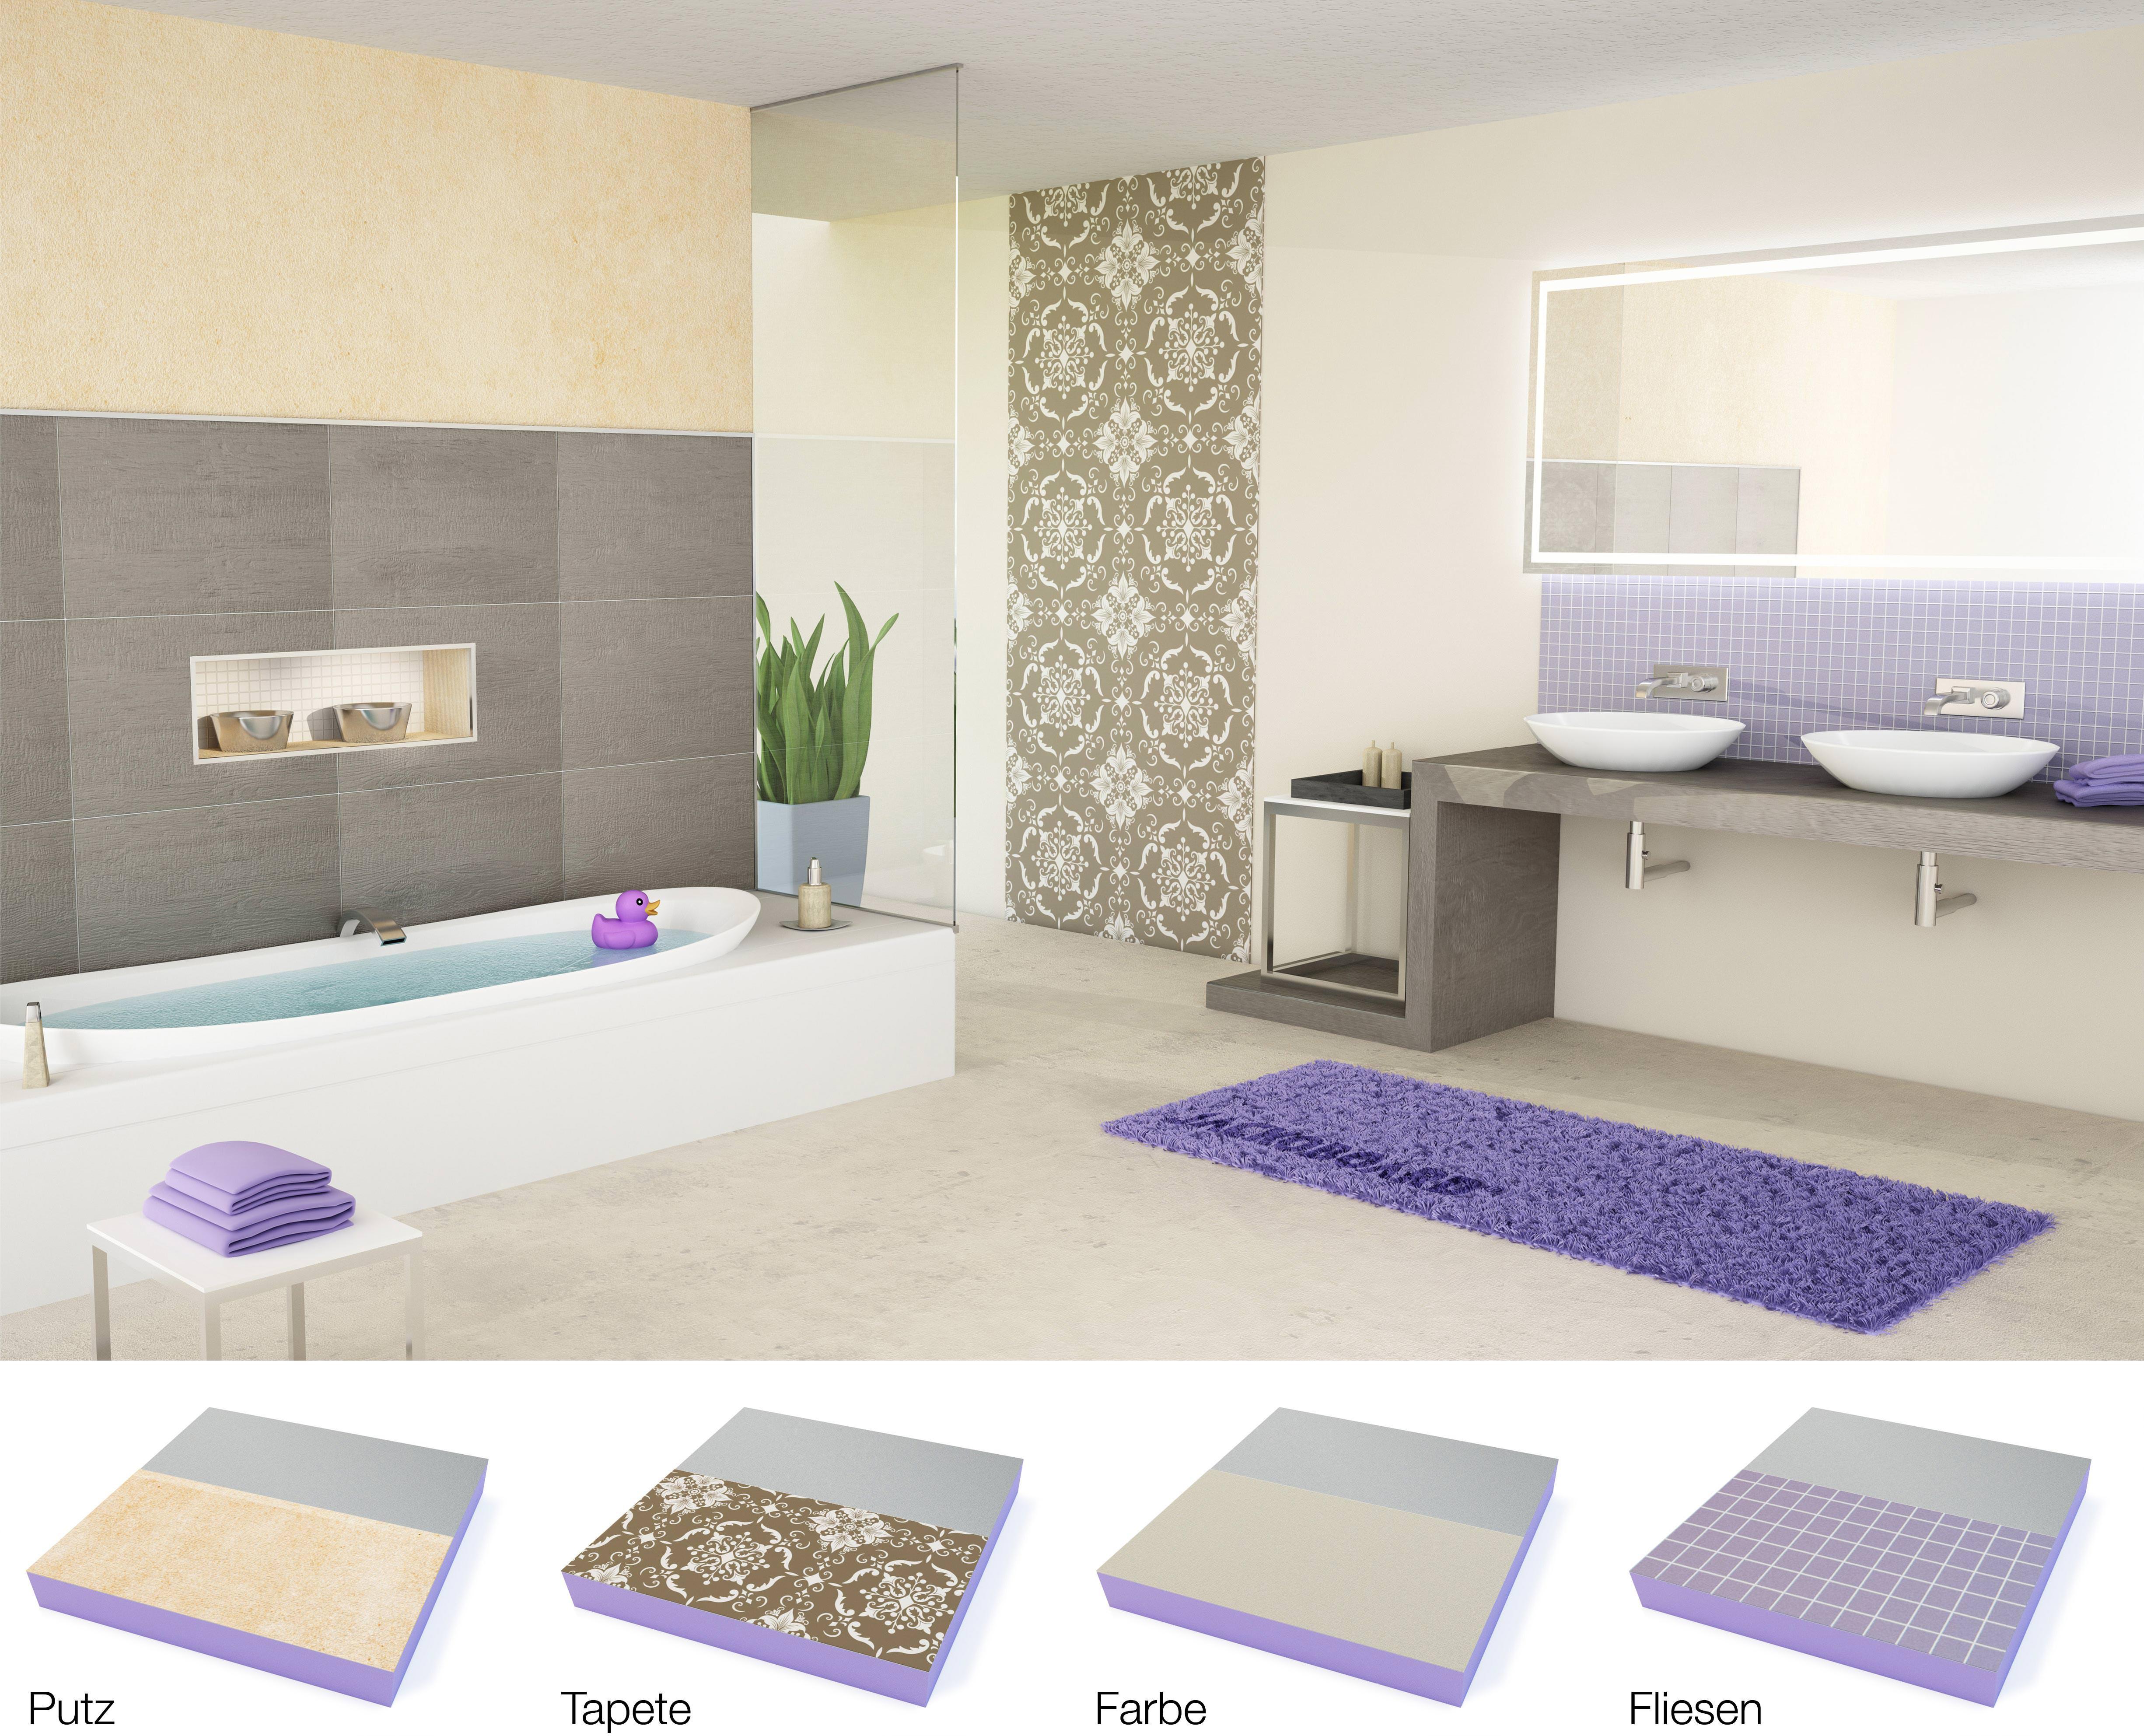 tapezieren oder verputzen affordable putz statt tapete fa r e matte innenwande verputzen statt. Black Bedroom Furniture Sets. Home Design Ideas